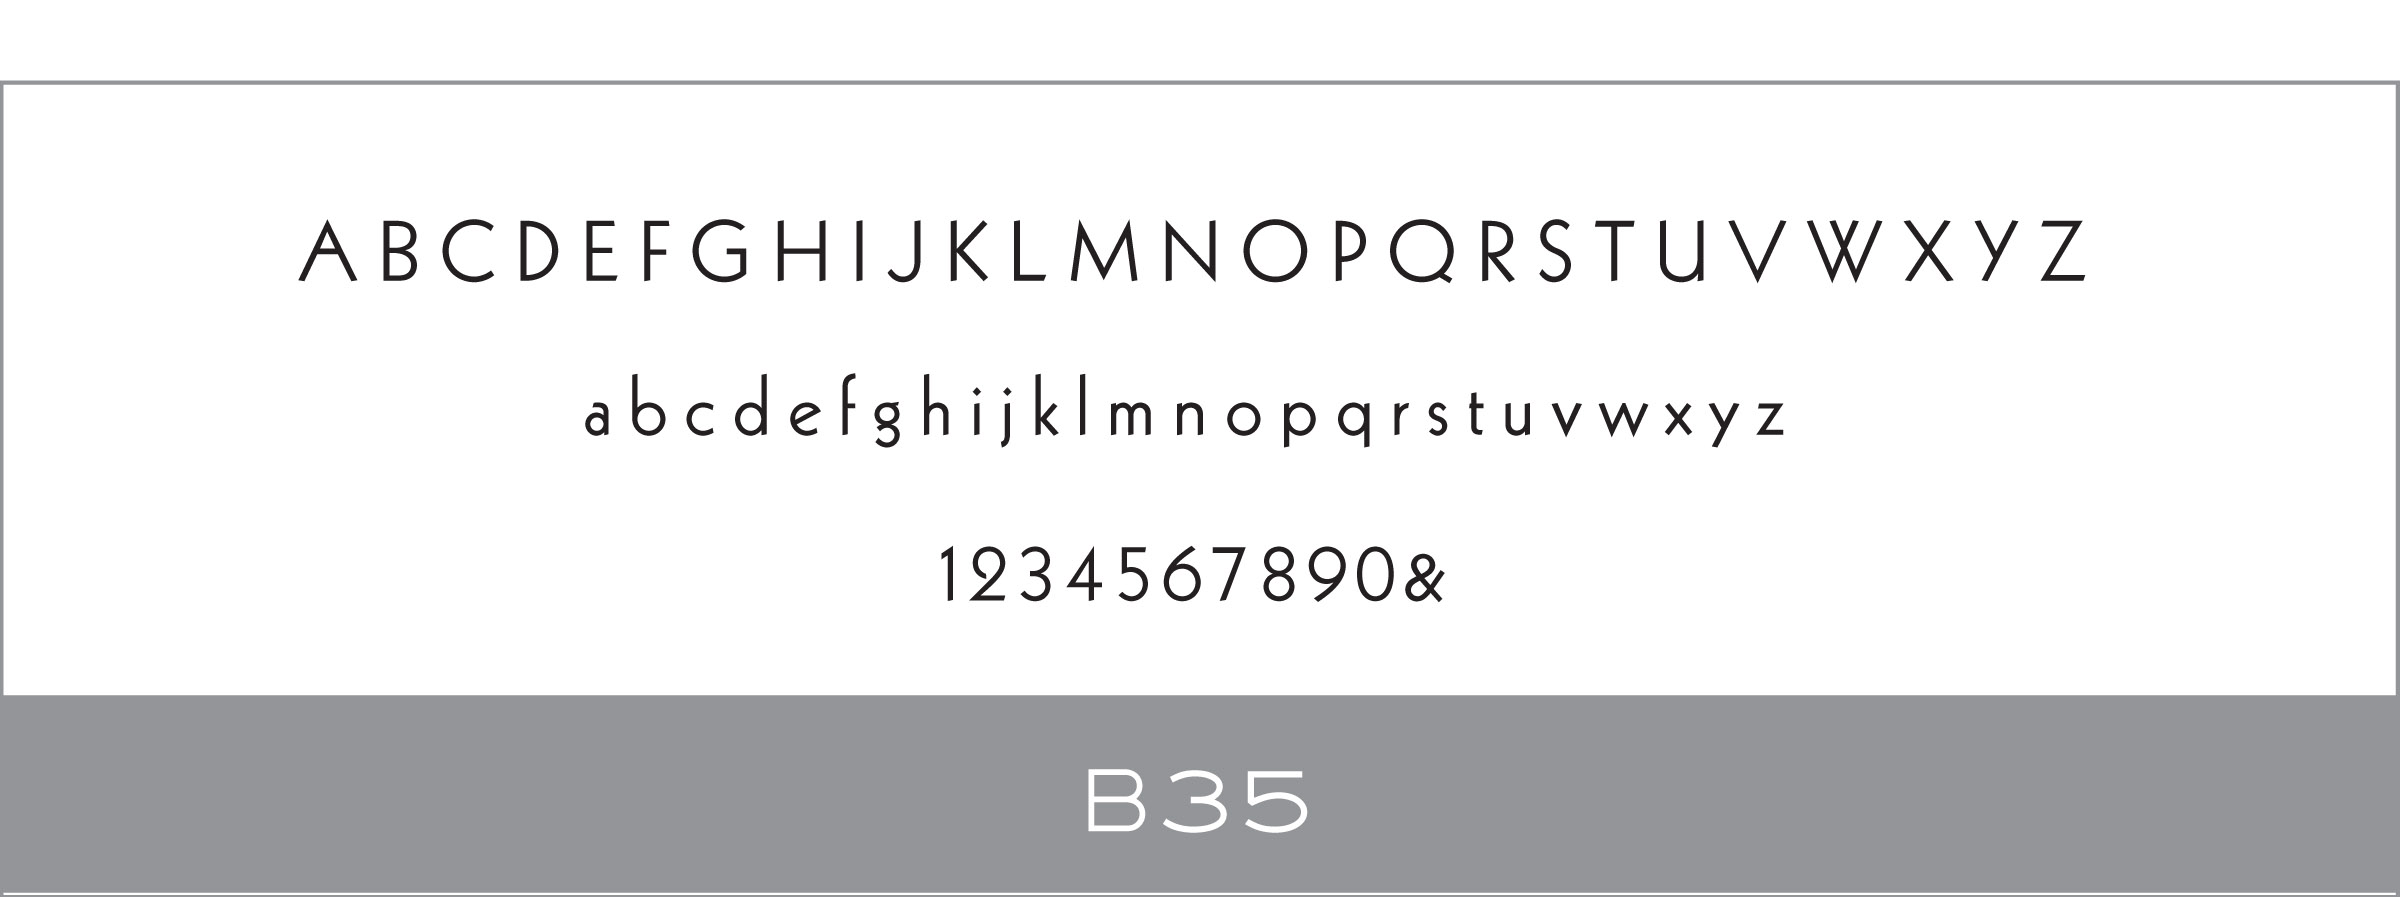 B35_Haute_Papier_Font.jpg